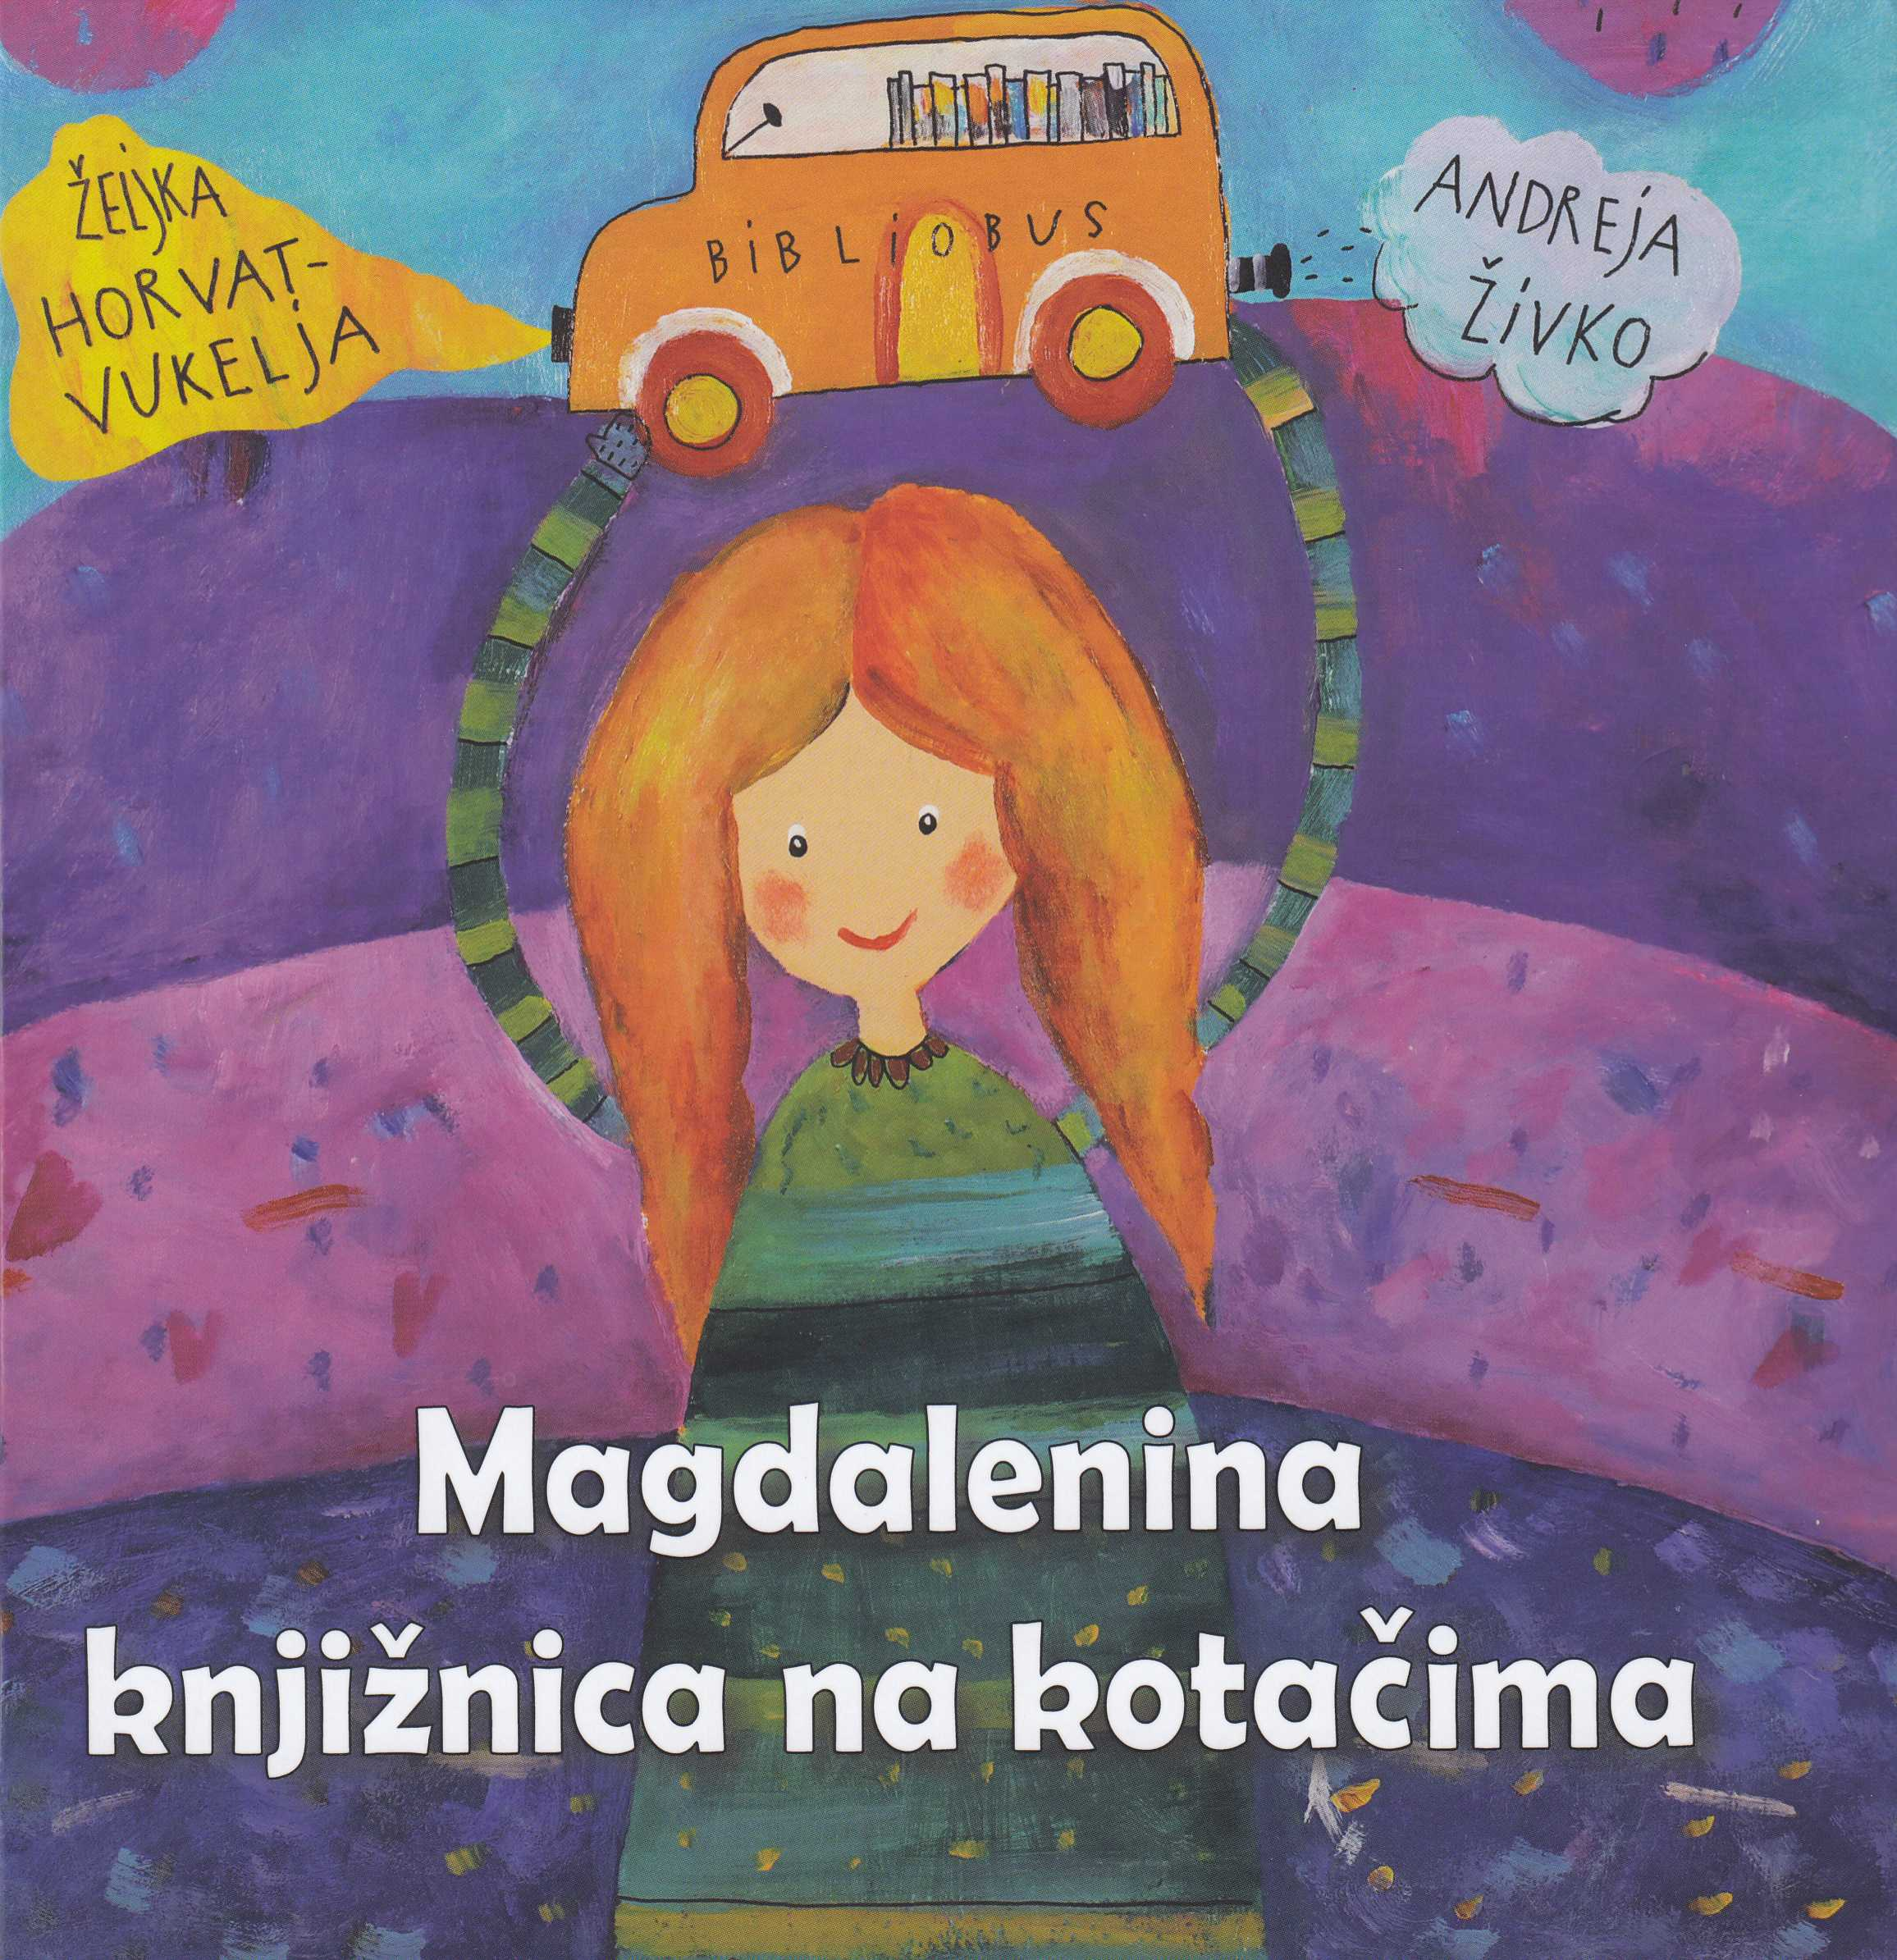 Magdalenina knjižnica na kotačima